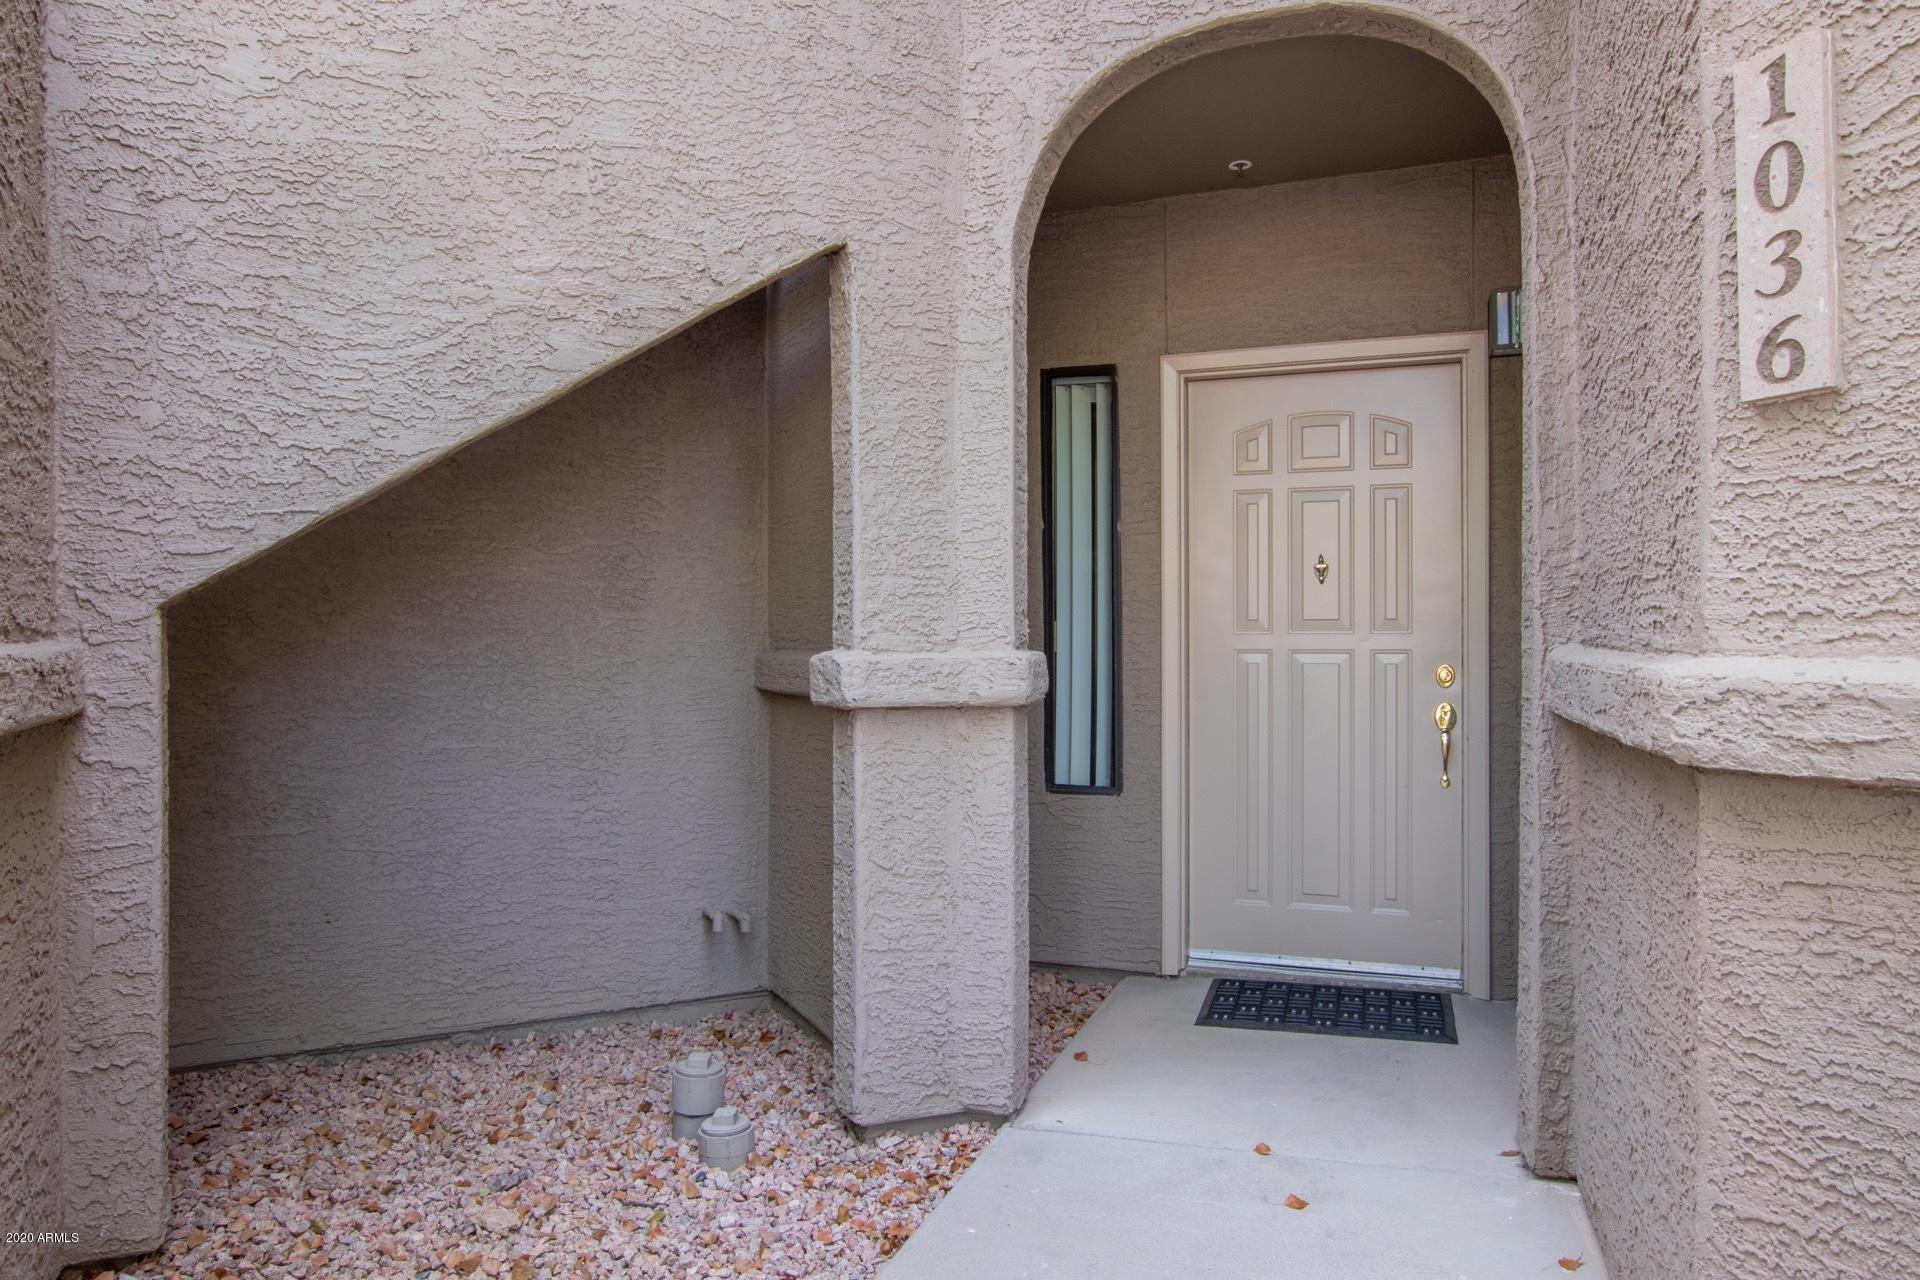 Photo of 15050 N THOMPSON PEAK Parkway #1036, Scottsdale, AZ 85260